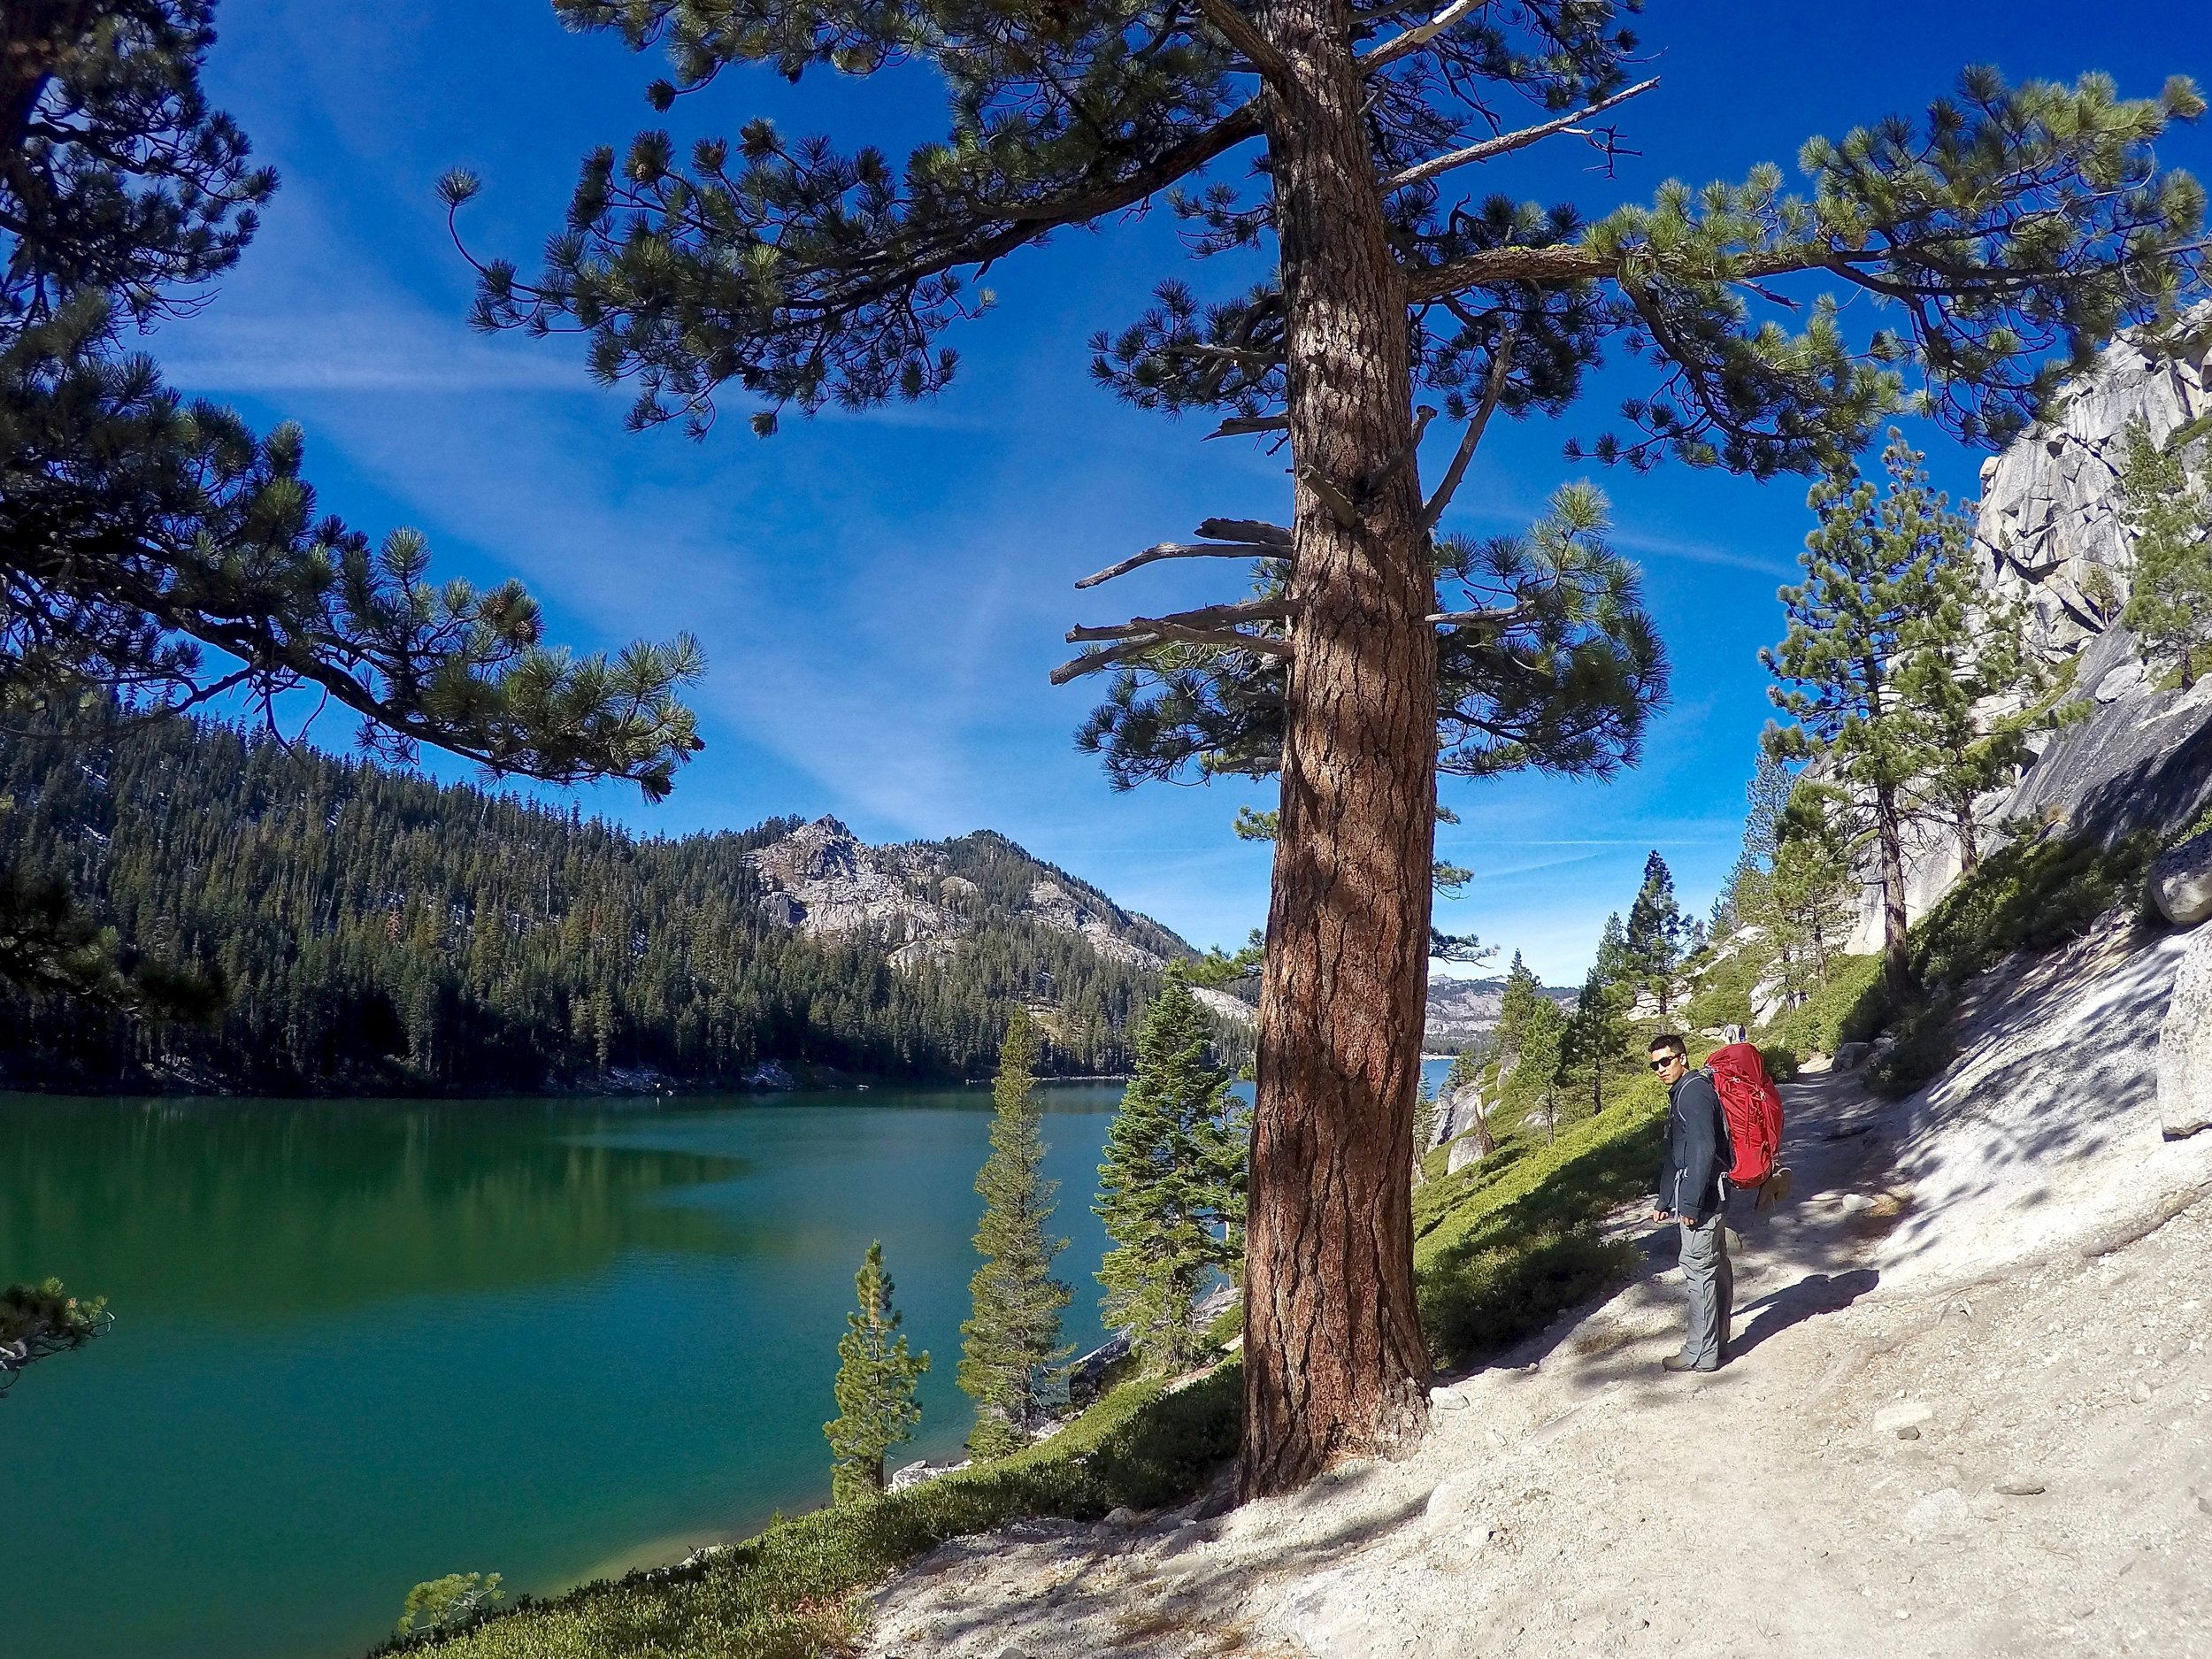 Hiking along the flat trail by Lower Echo Lake